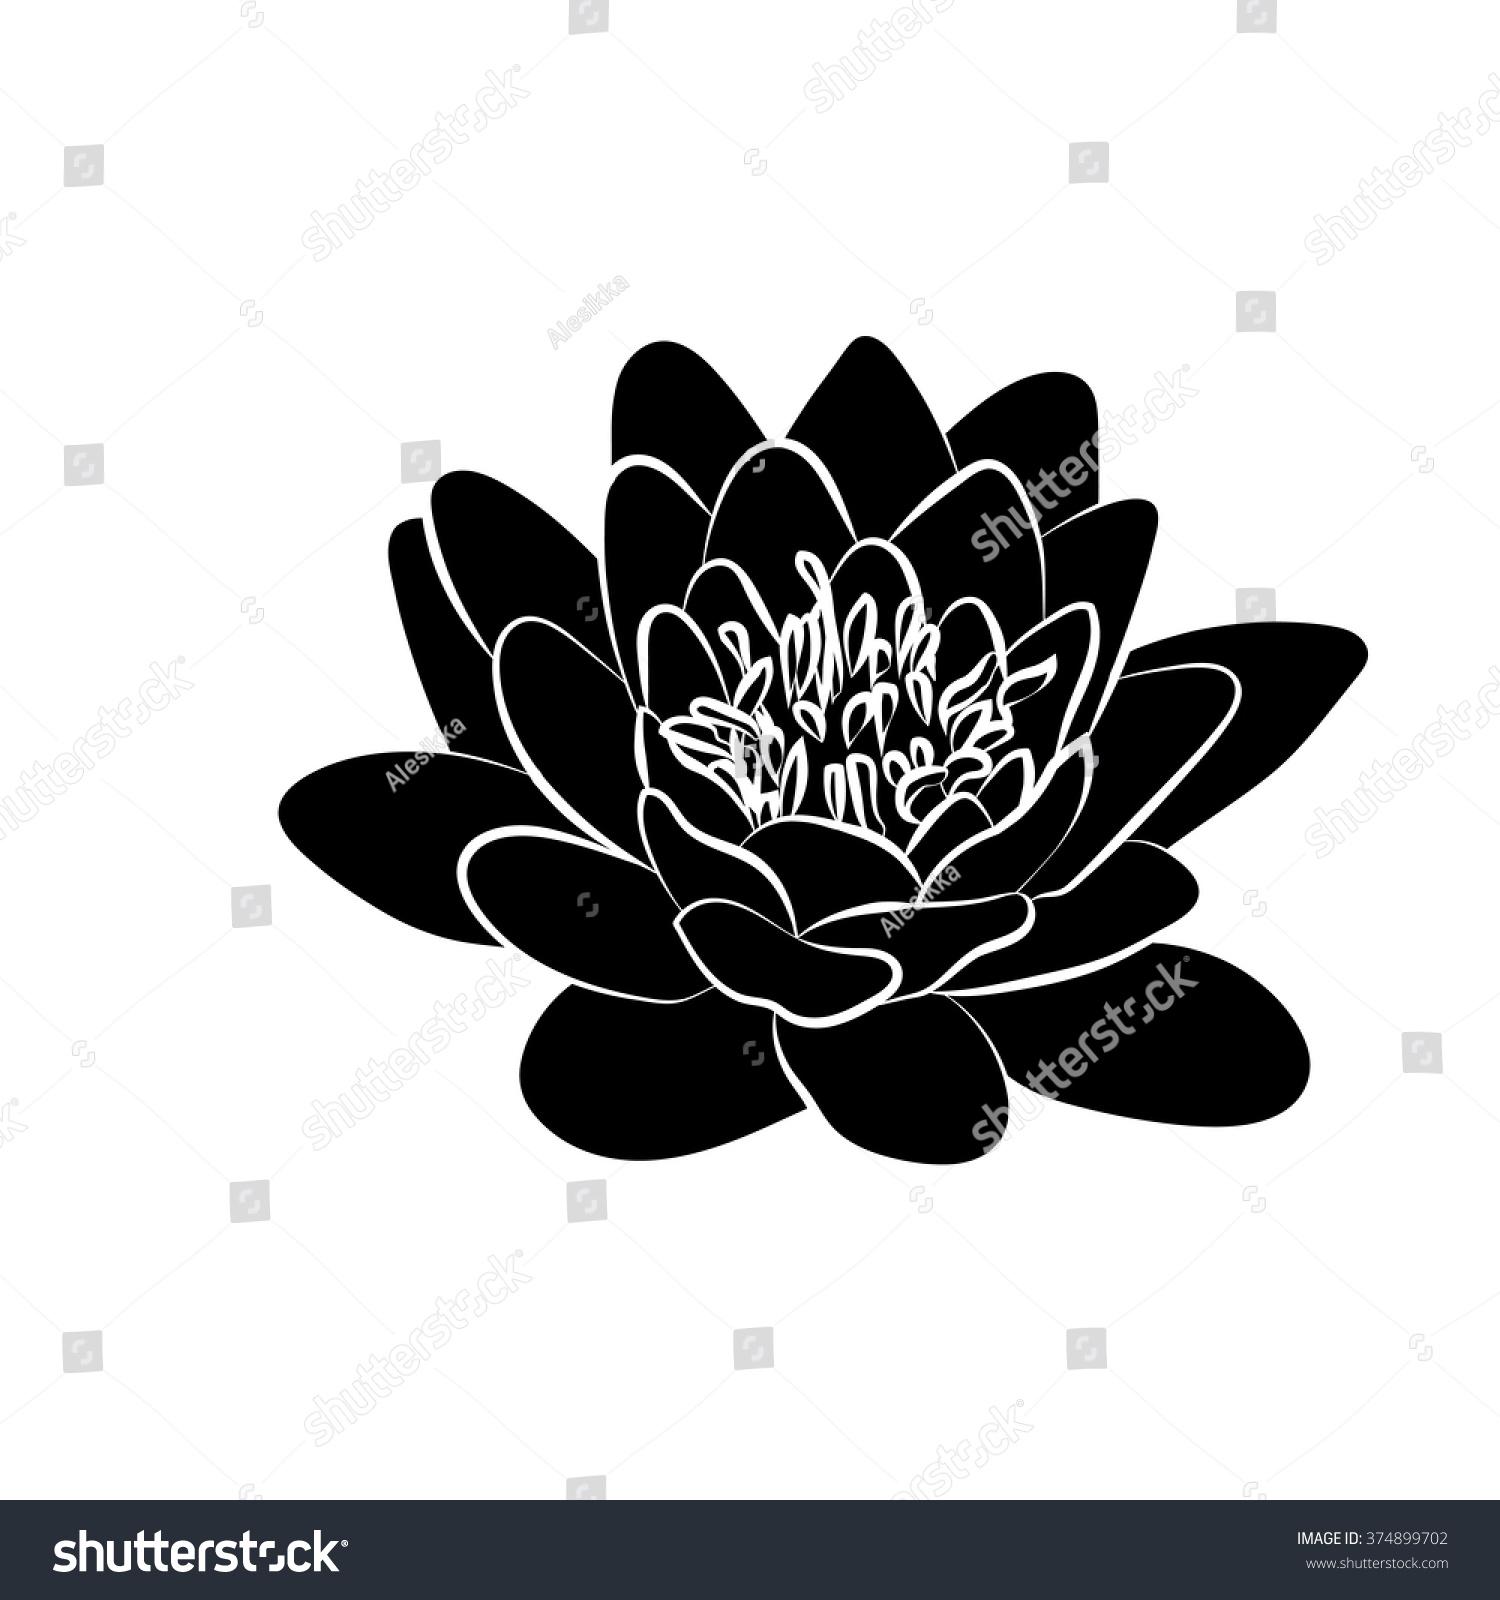 Black Silhouette Of Lotus Flowers Icon On A White Background Ez Canvas